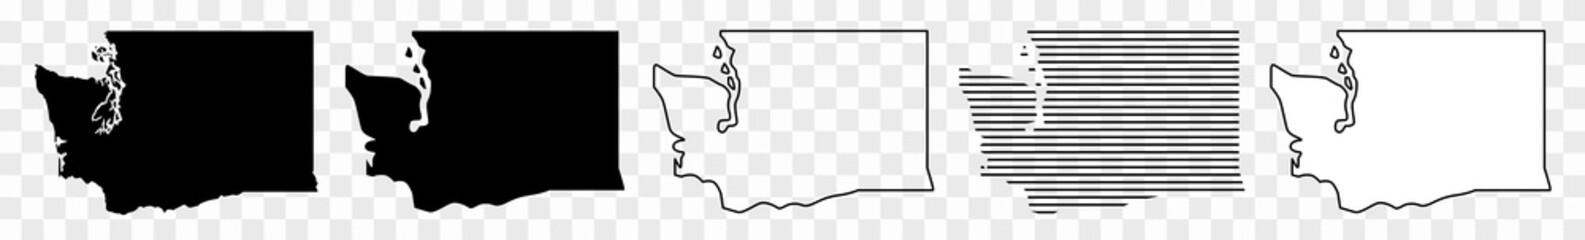 Washington Map Black | State Border | United States | US America | Transparent Isolated | Variations Fototapete